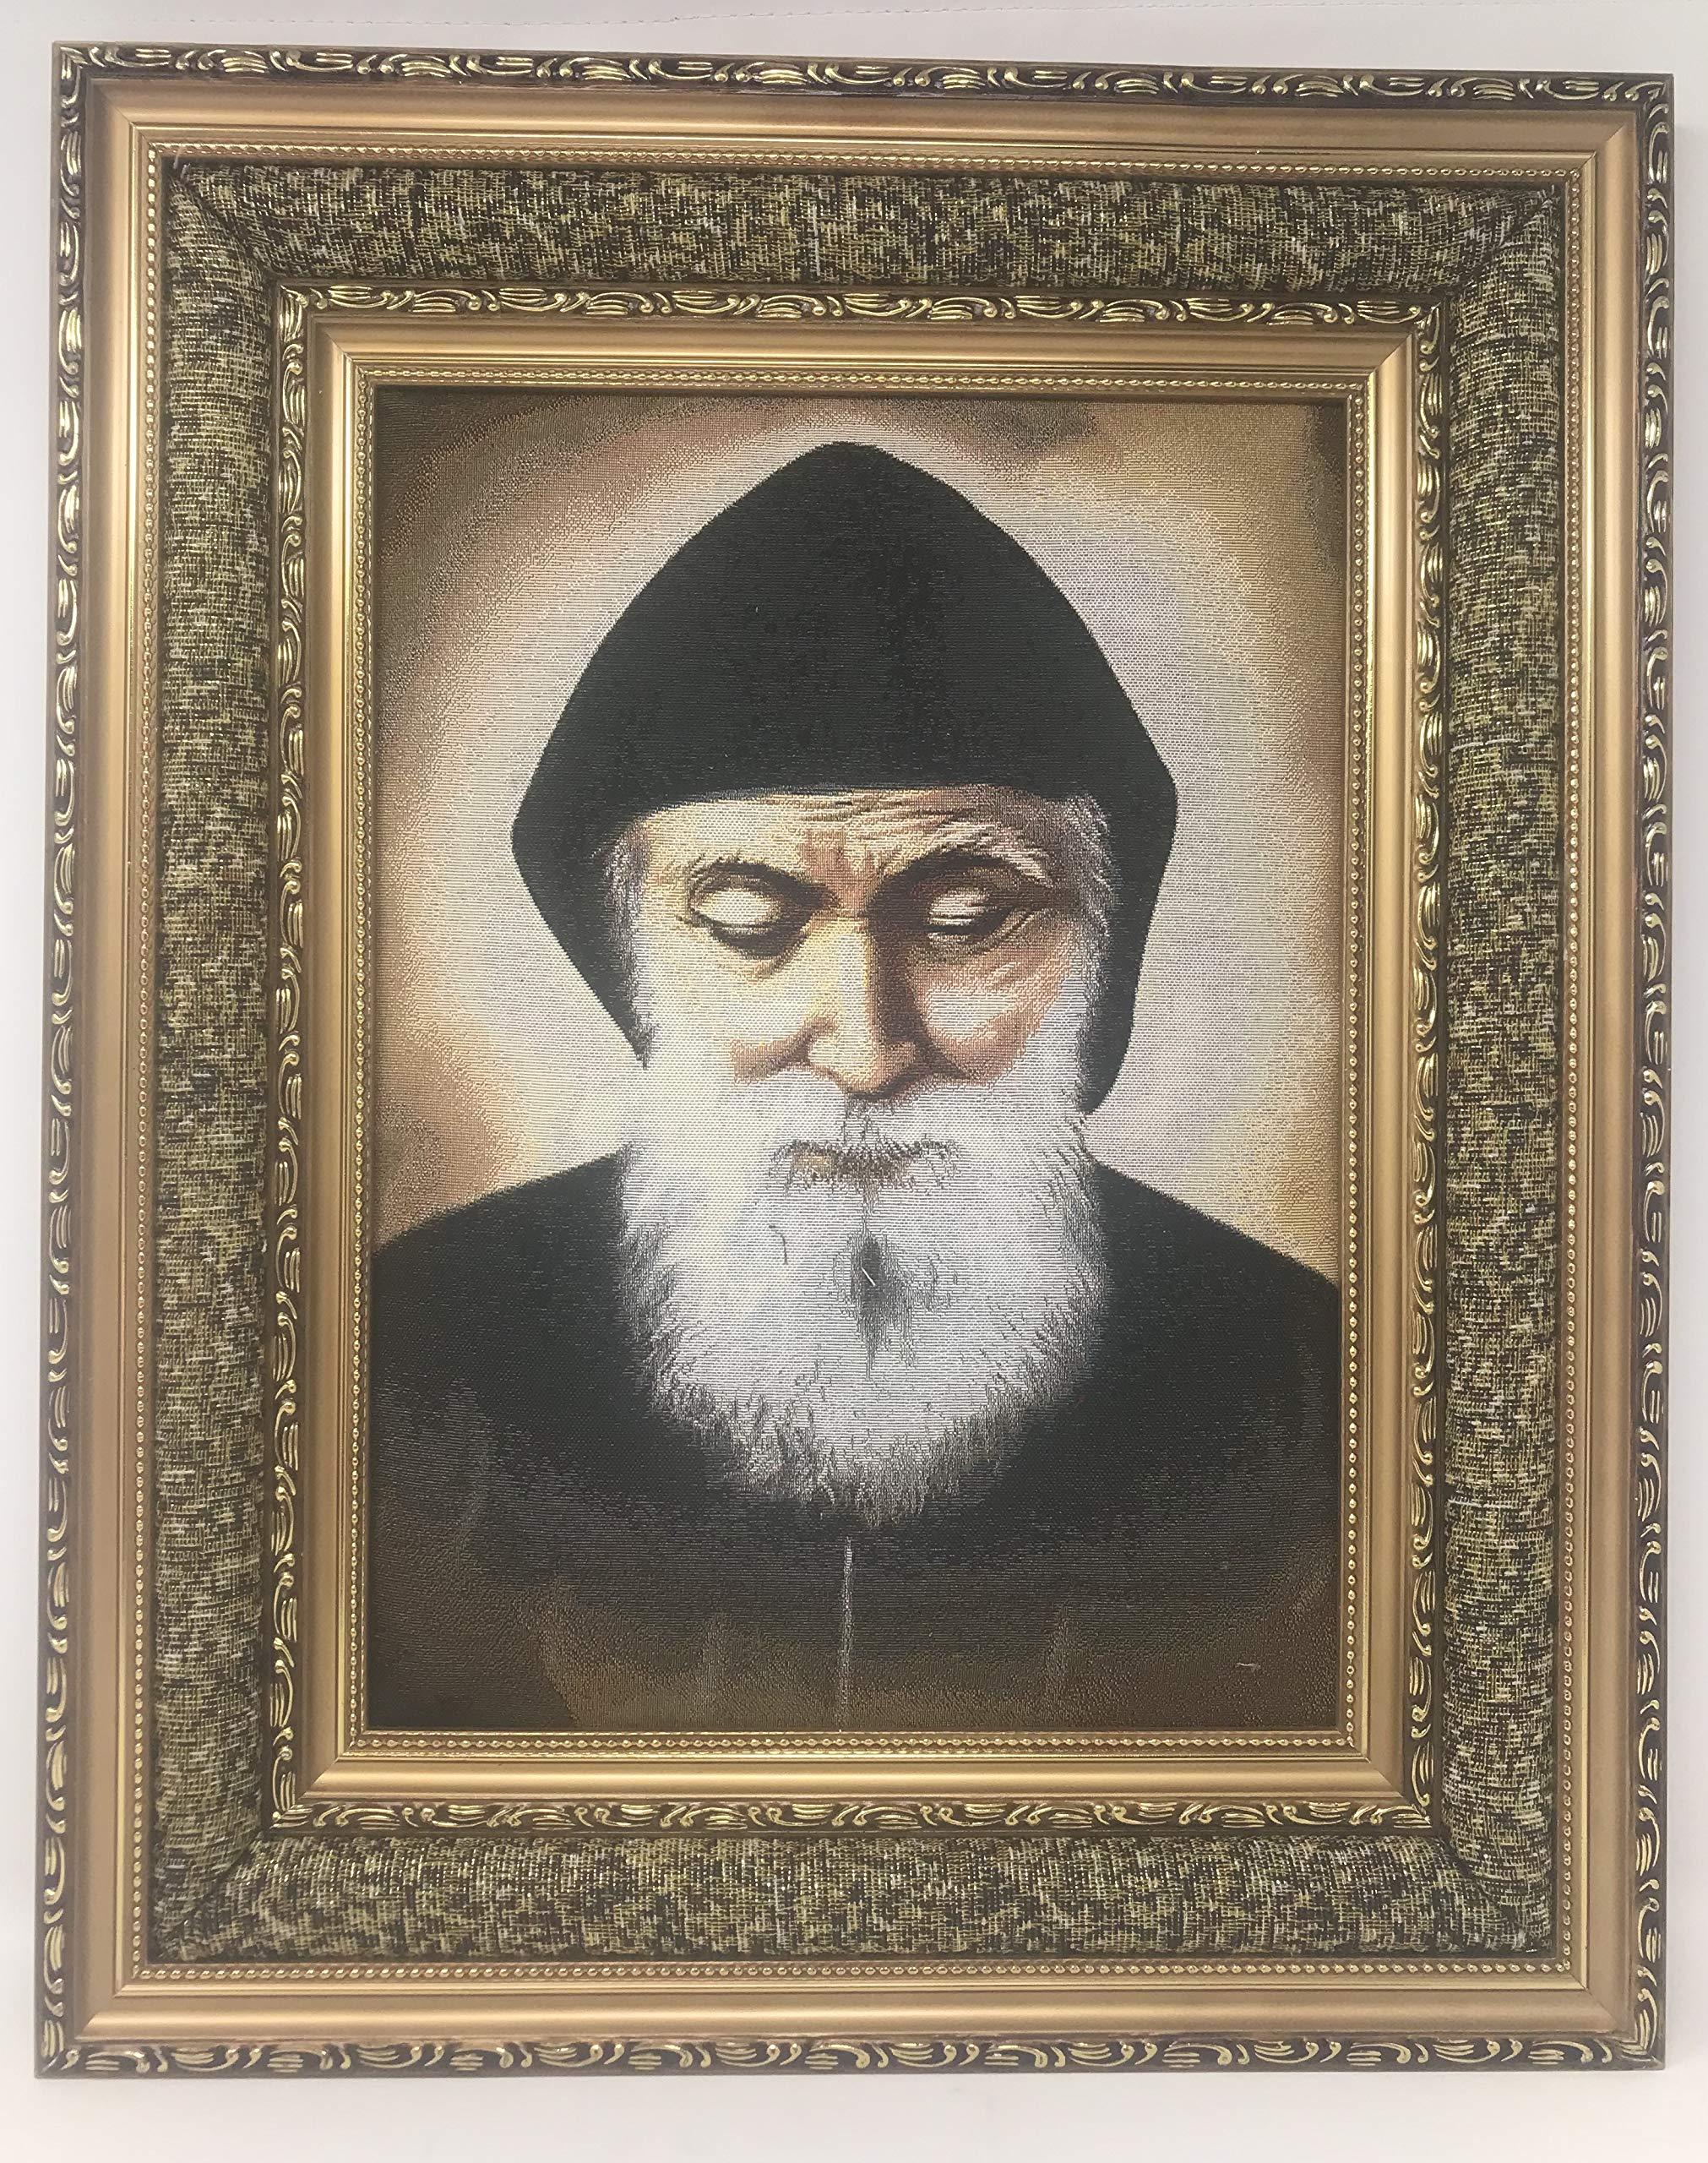 17''x21'' San Charbel Imagen en Tela Acojinada, Cushioned Frame Saint Charbel Makhluf